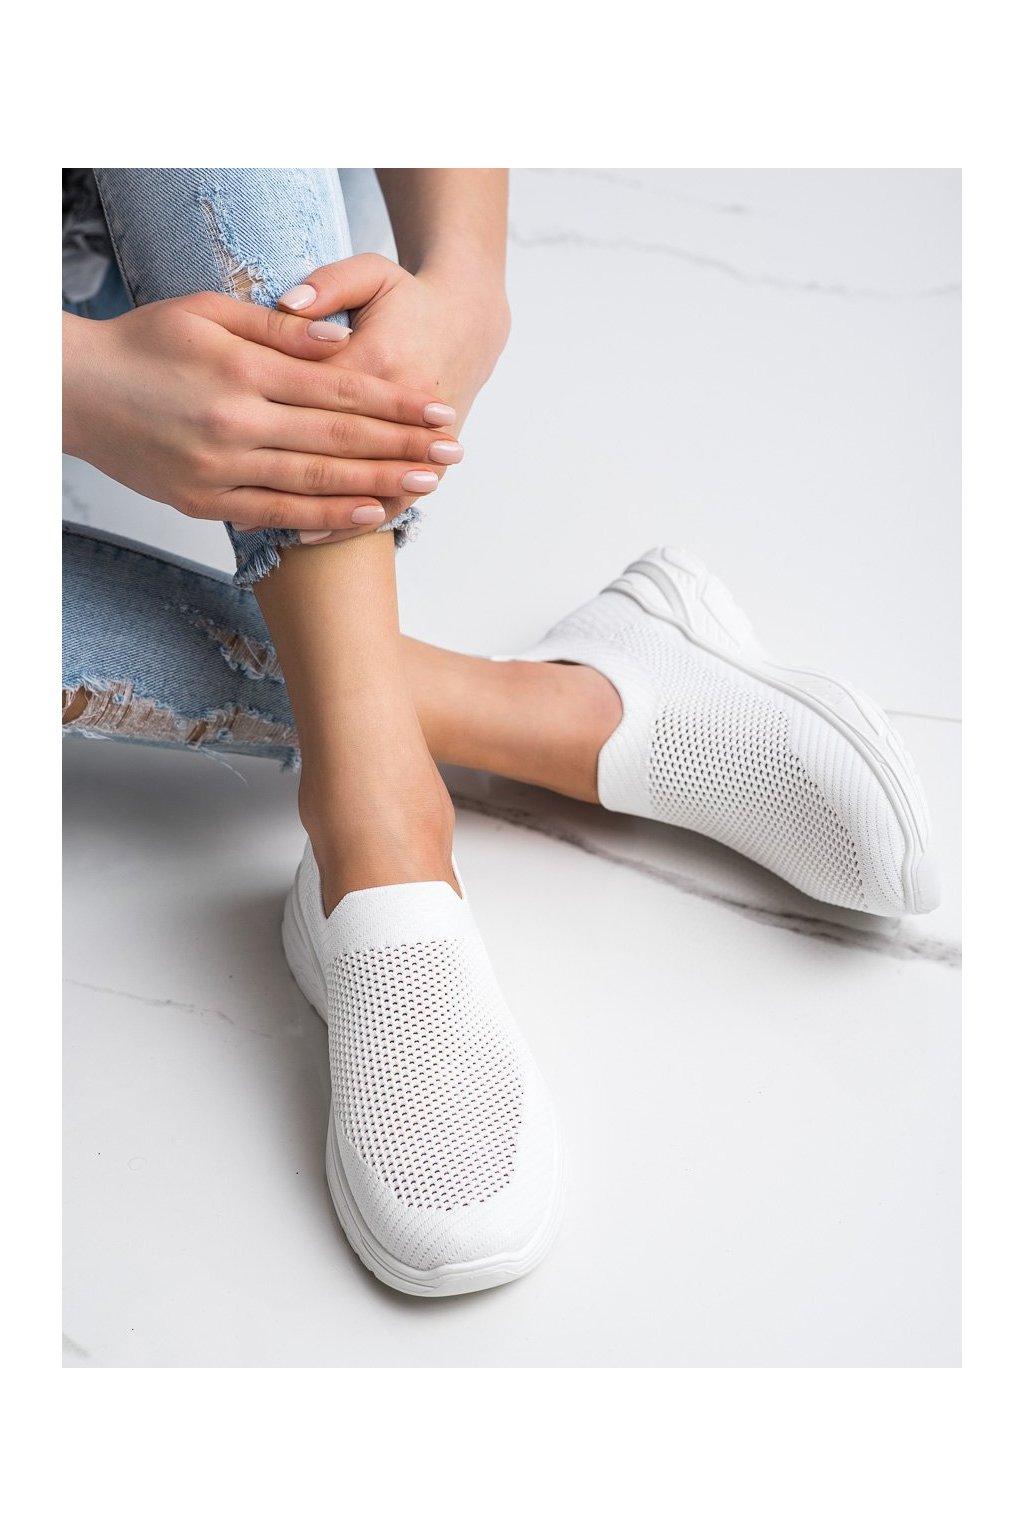 Biele tenisky Ideal shoes kod 9865W